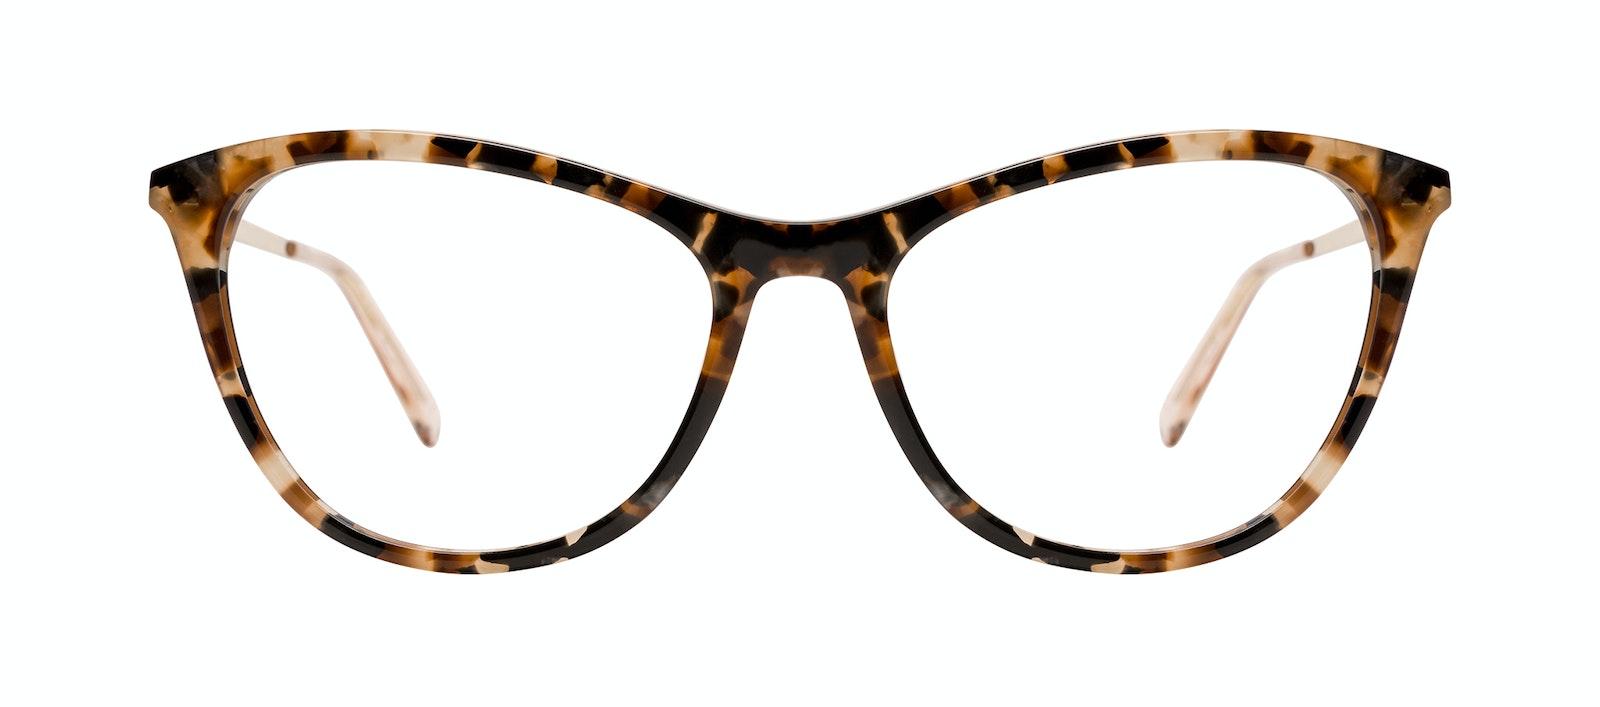 Affordable Fashion Glasses Rectangle Eyeglasses Women Folk Plus Gold Flake Front